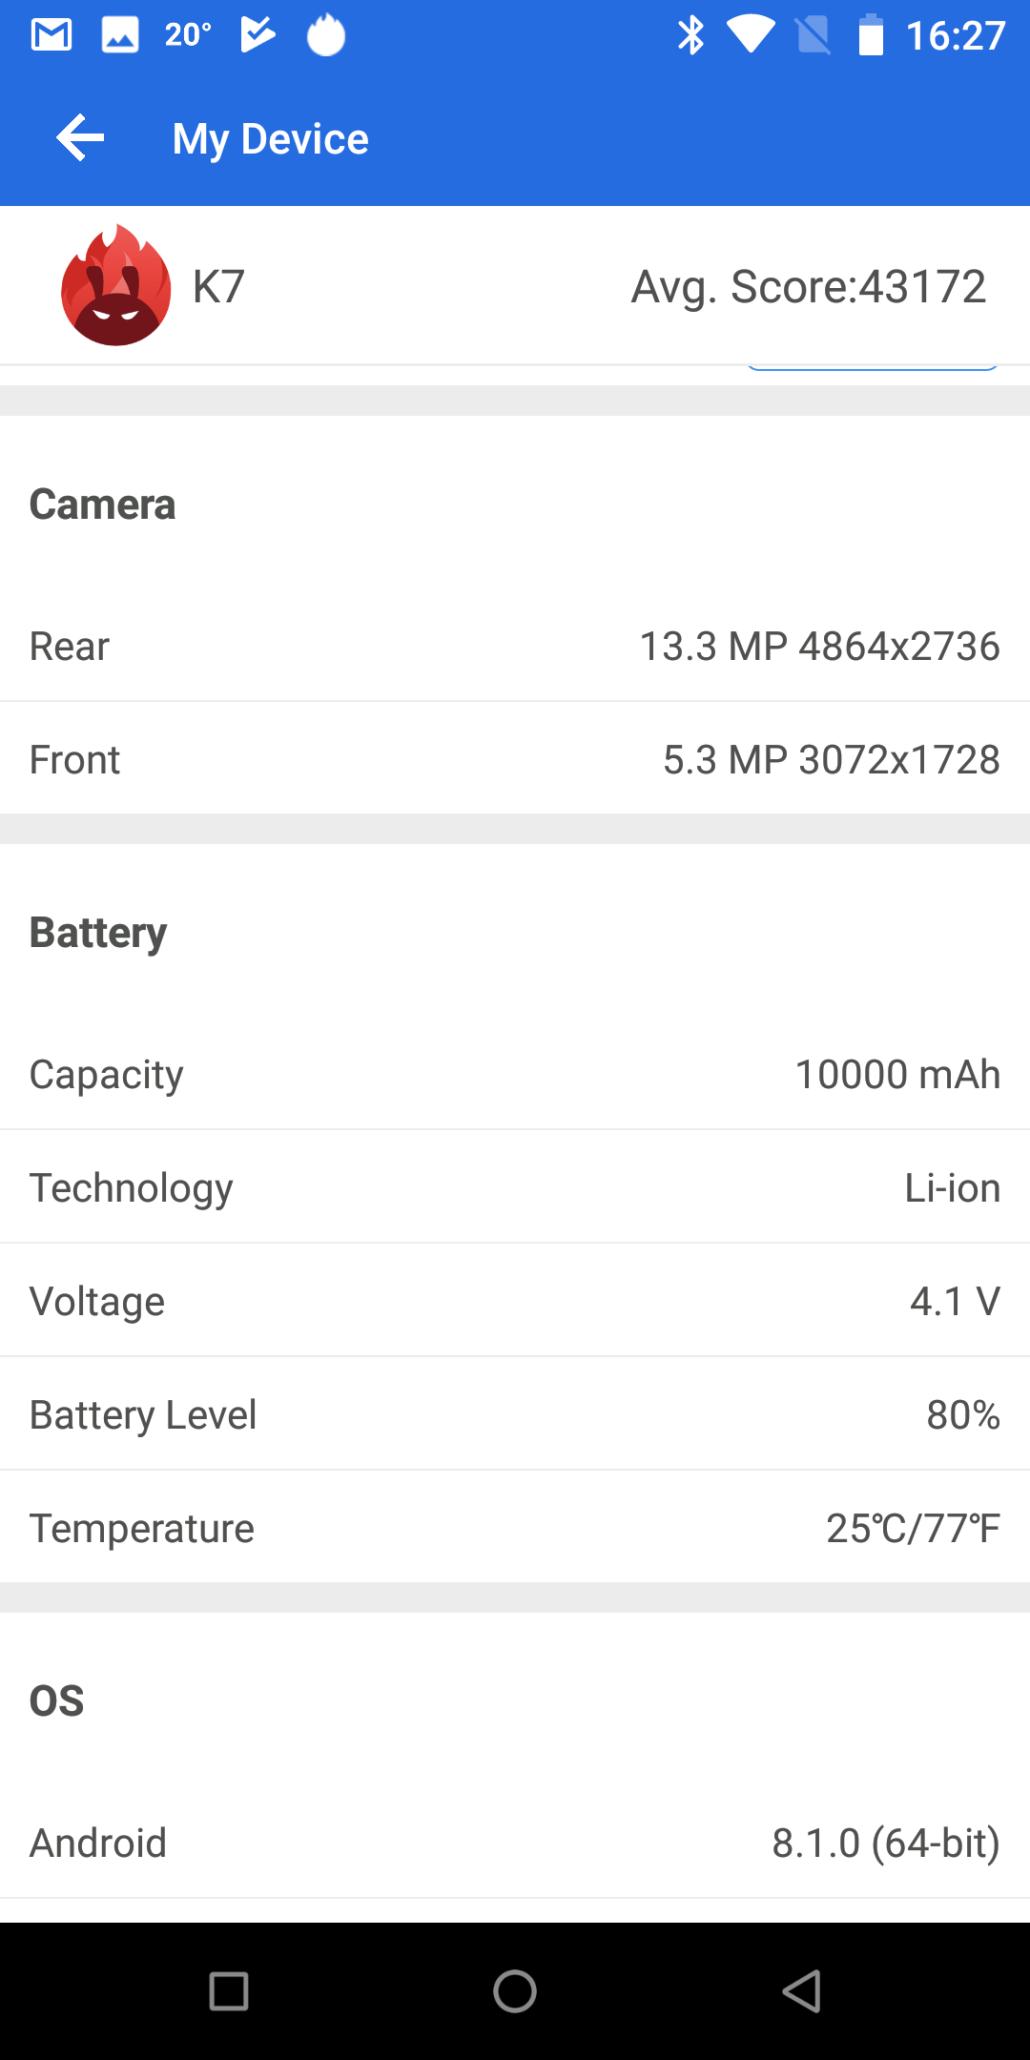 oukitel-k7-phone-review-05-part-6-antutu-camera-battery